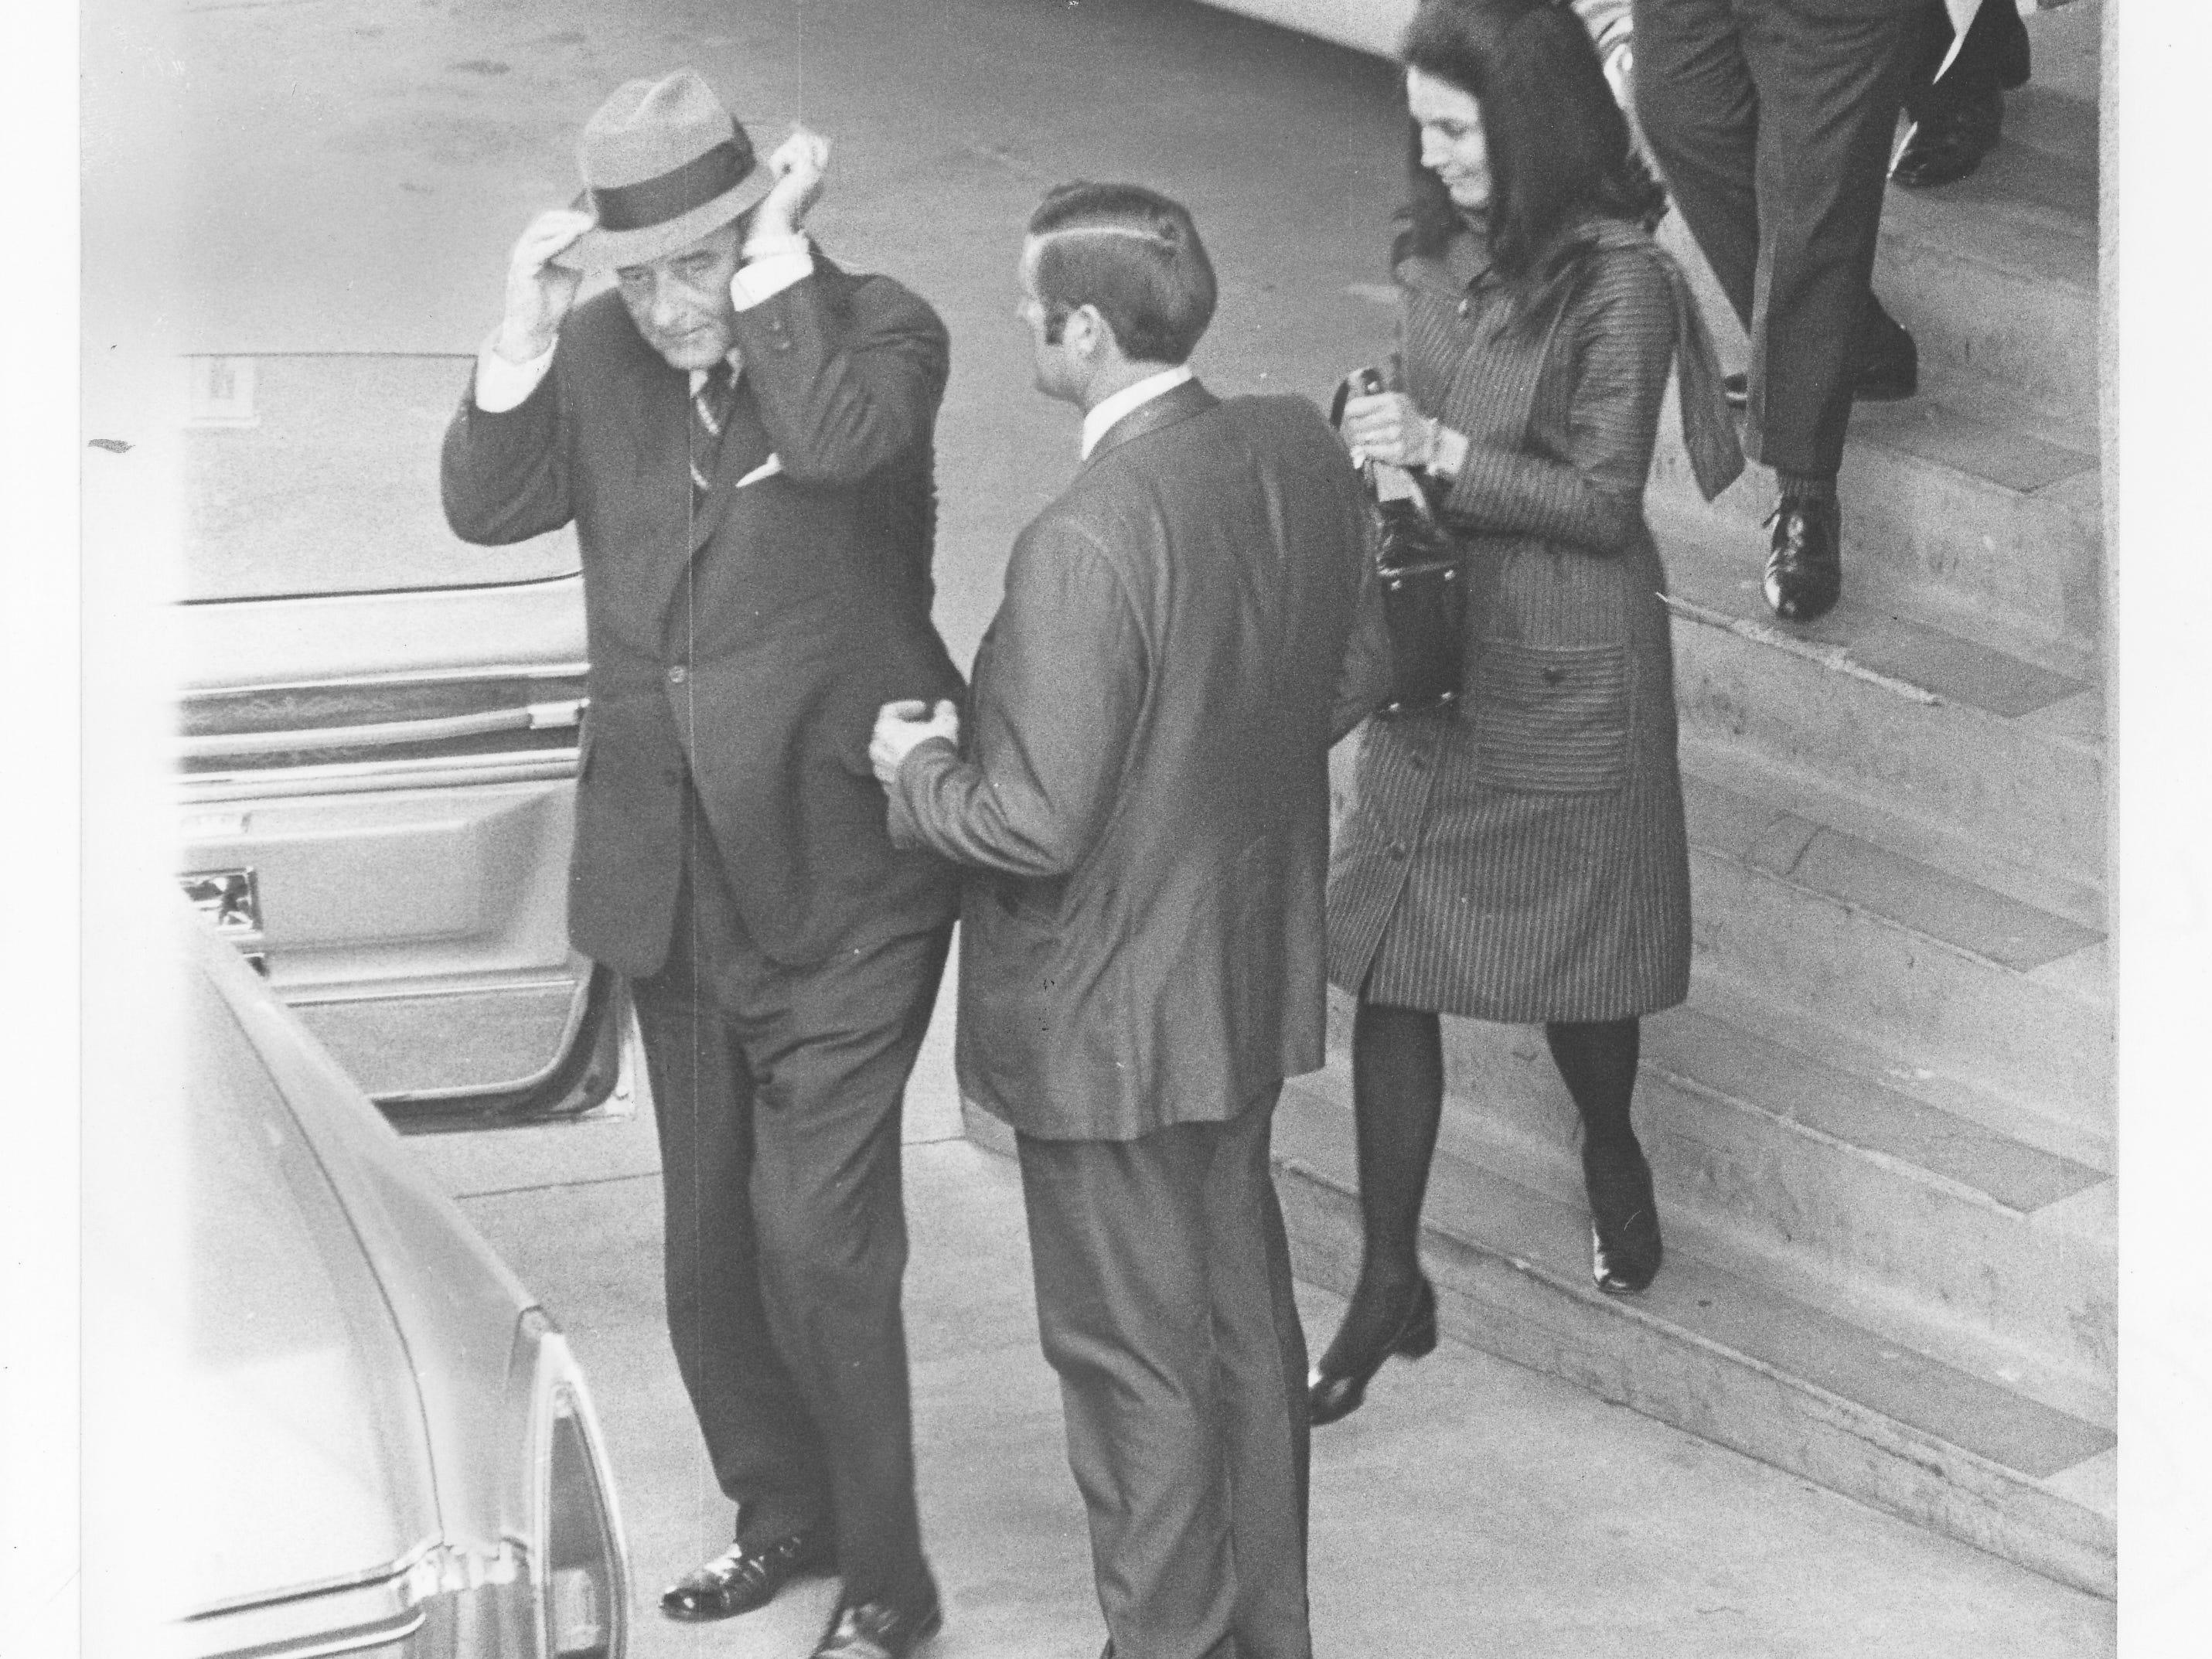 Former President Lyndon Johnson (left) attends the funeral of former U.S. Sen. Carl Hayden in Phoenix in 1972.